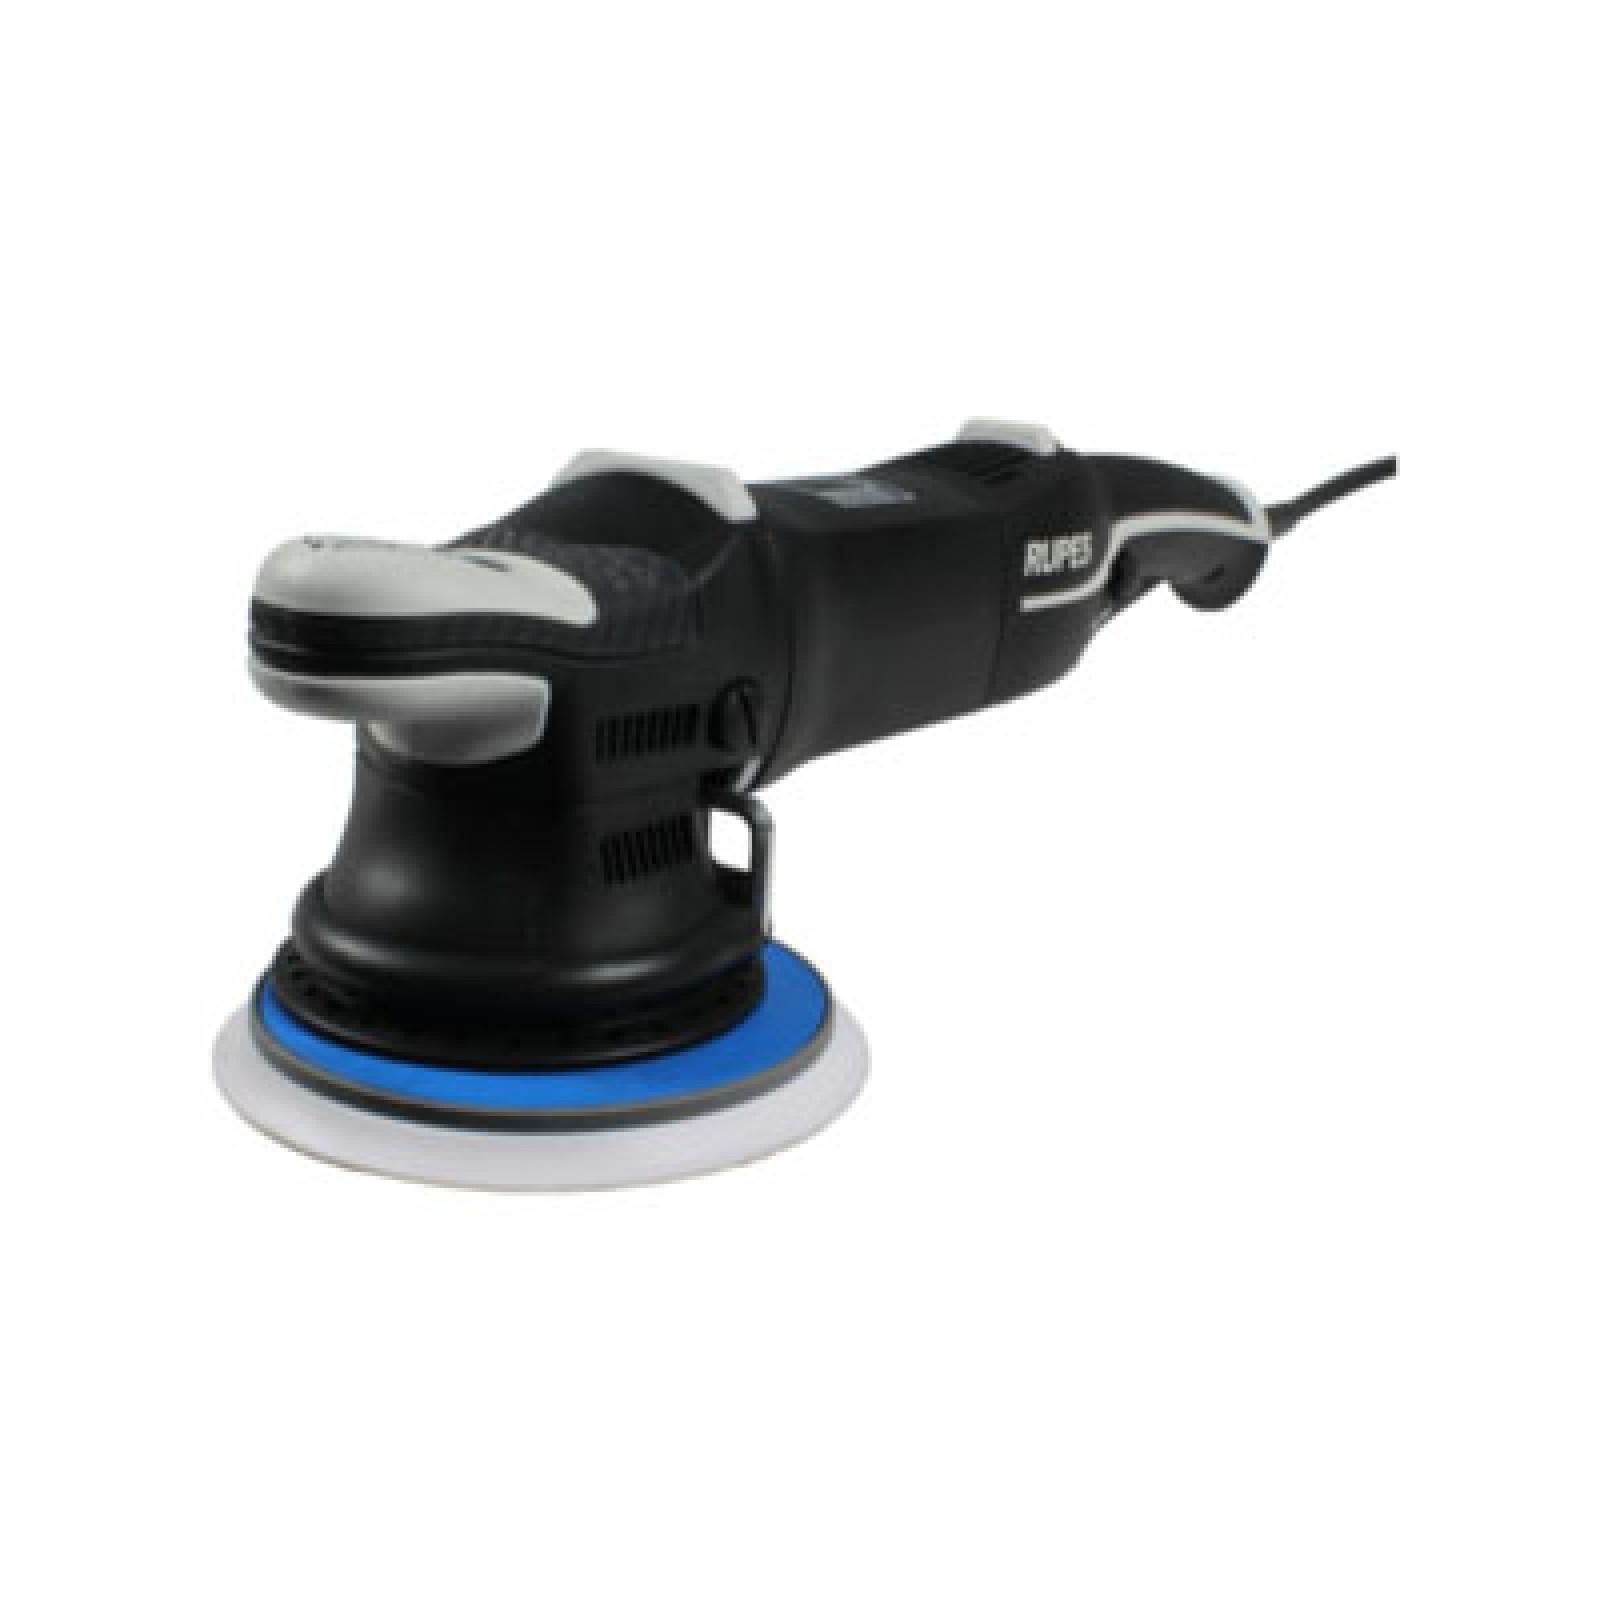 Rupes Big Foot poetsmachine 21 mm los (RU-LHR21ESSTD)